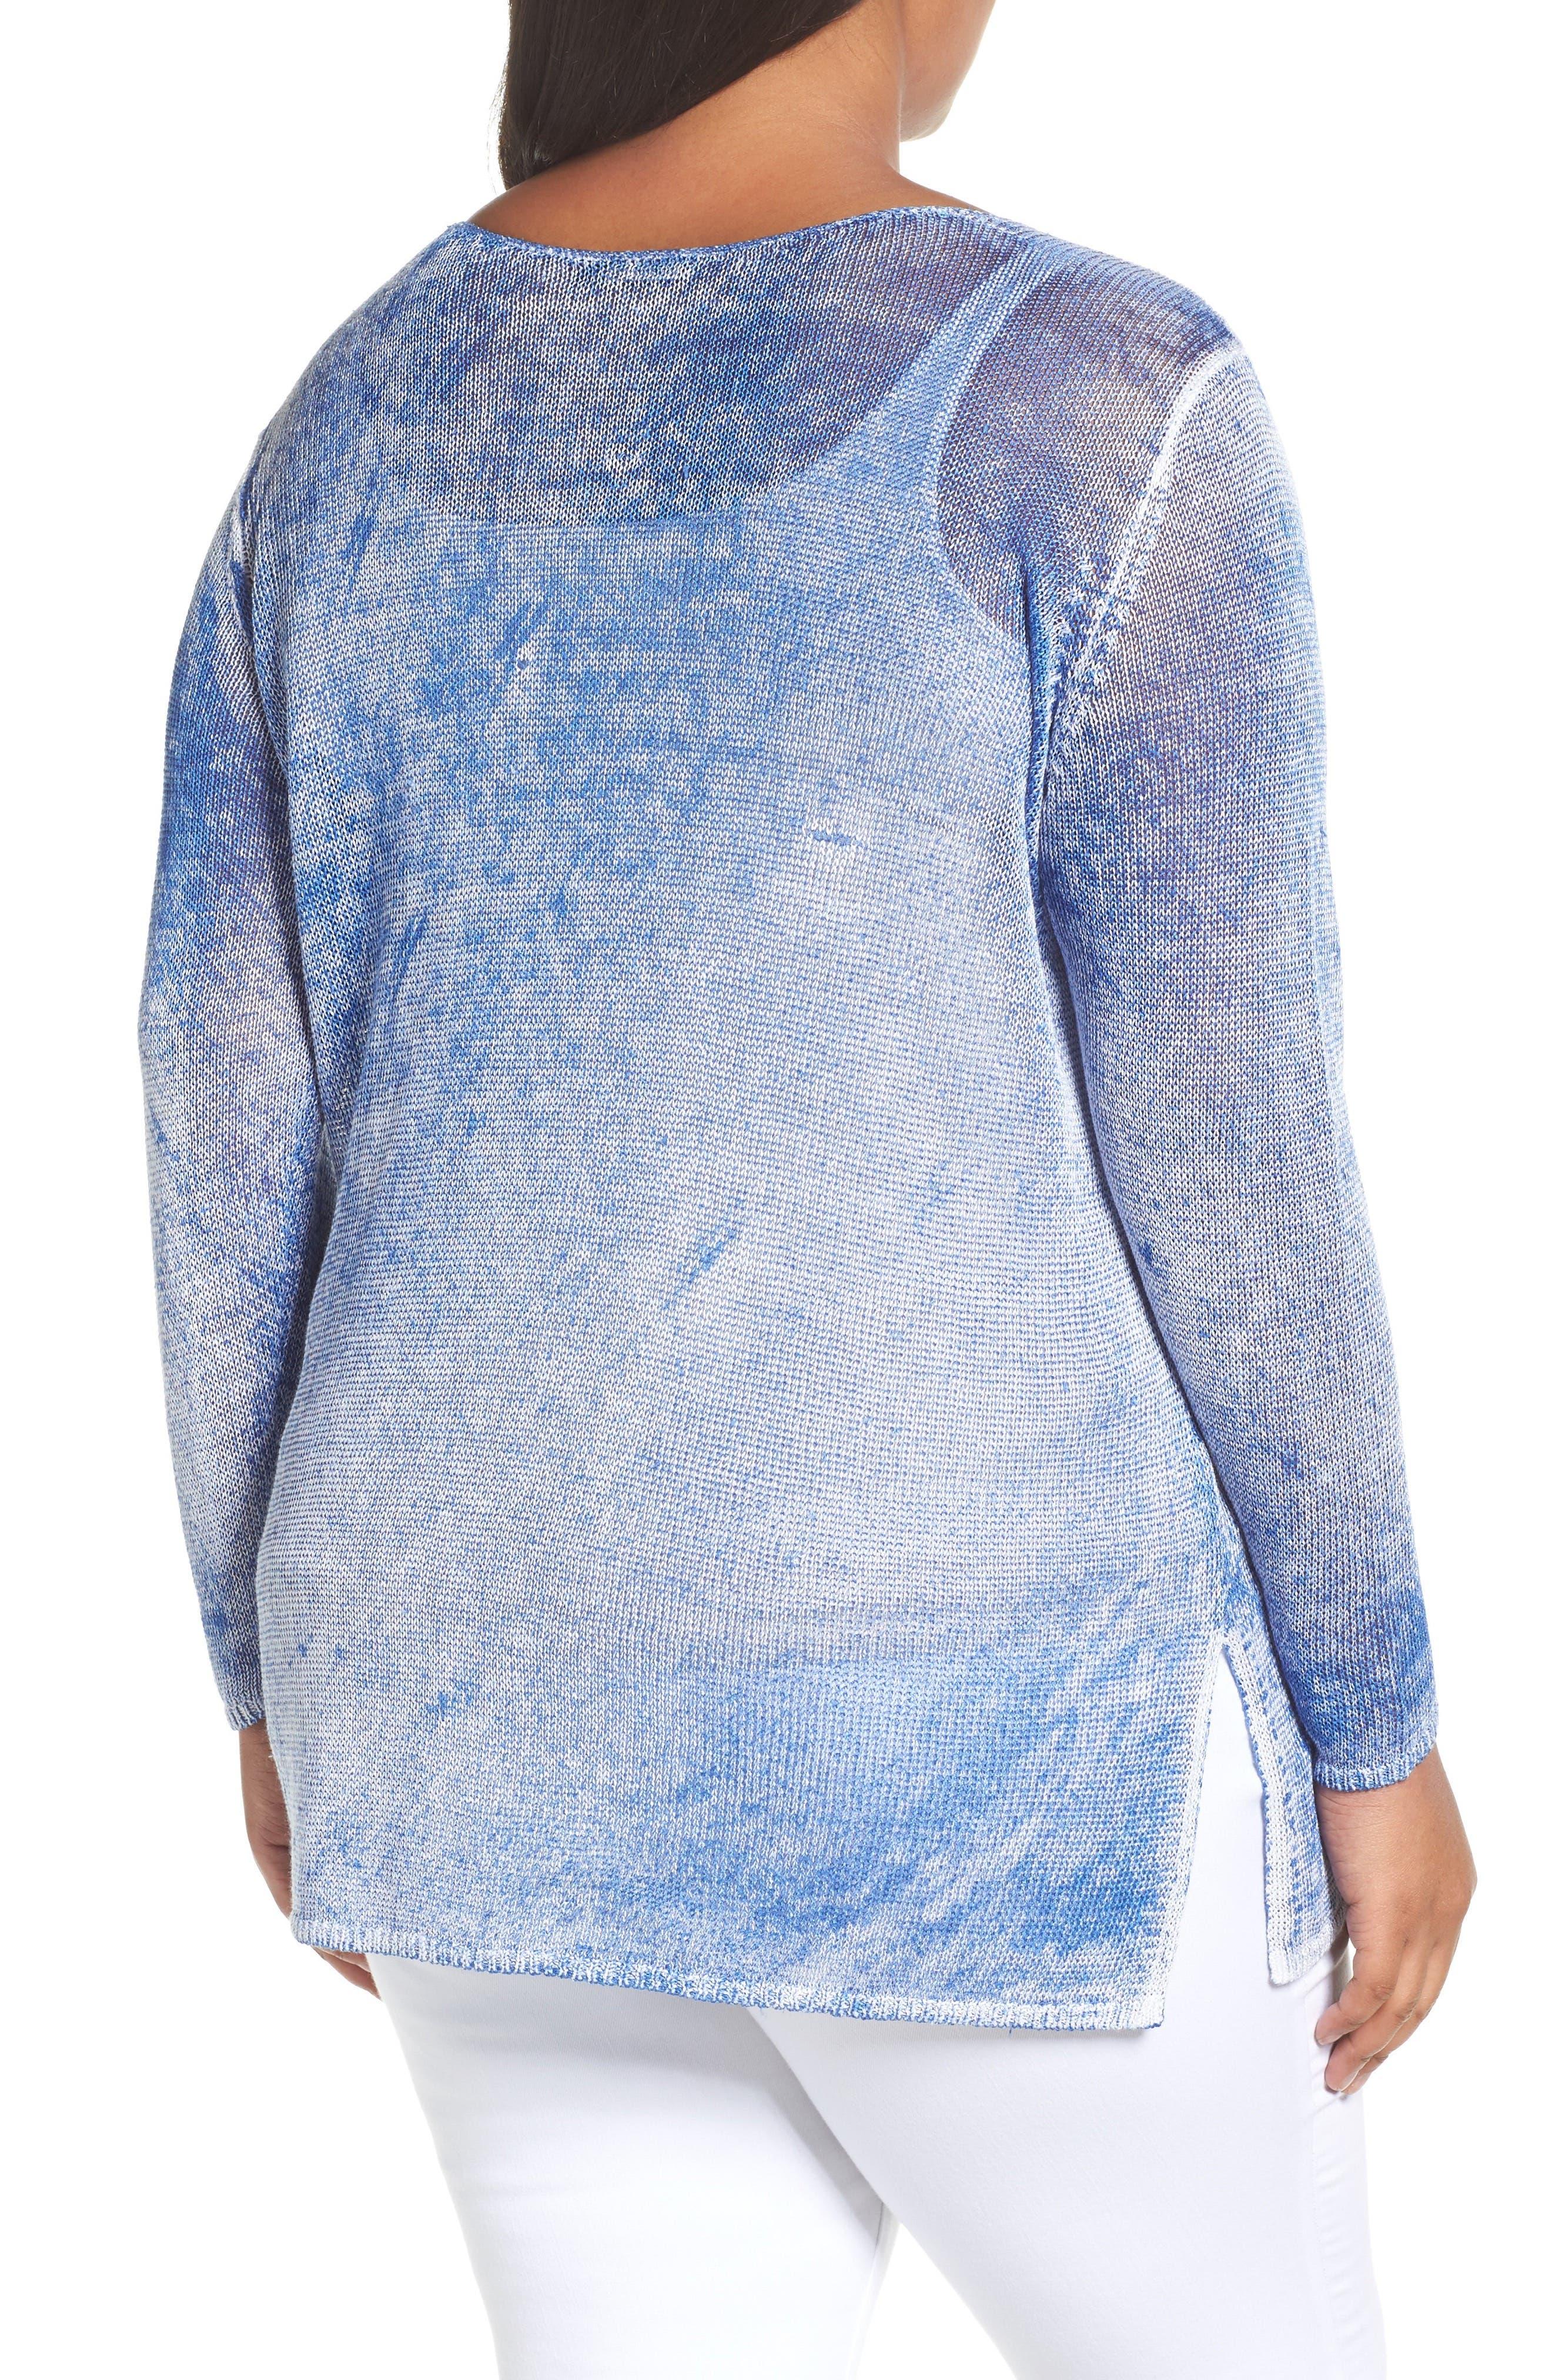 Poolside Linen Blend Pullover,                             Alternate thumbnail 2, color,                             POOLSIDE